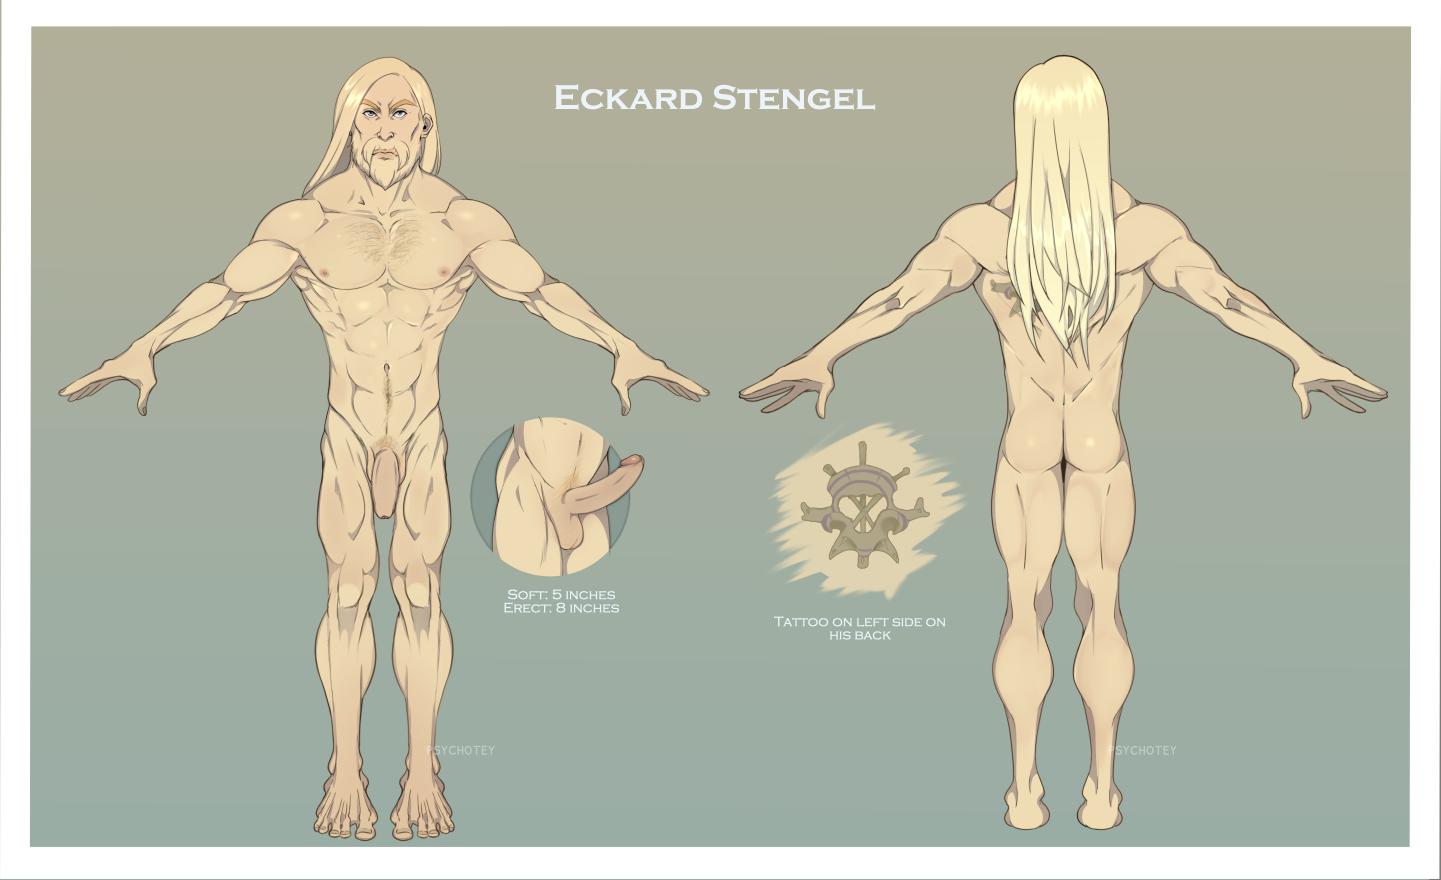 Eckard Stengel